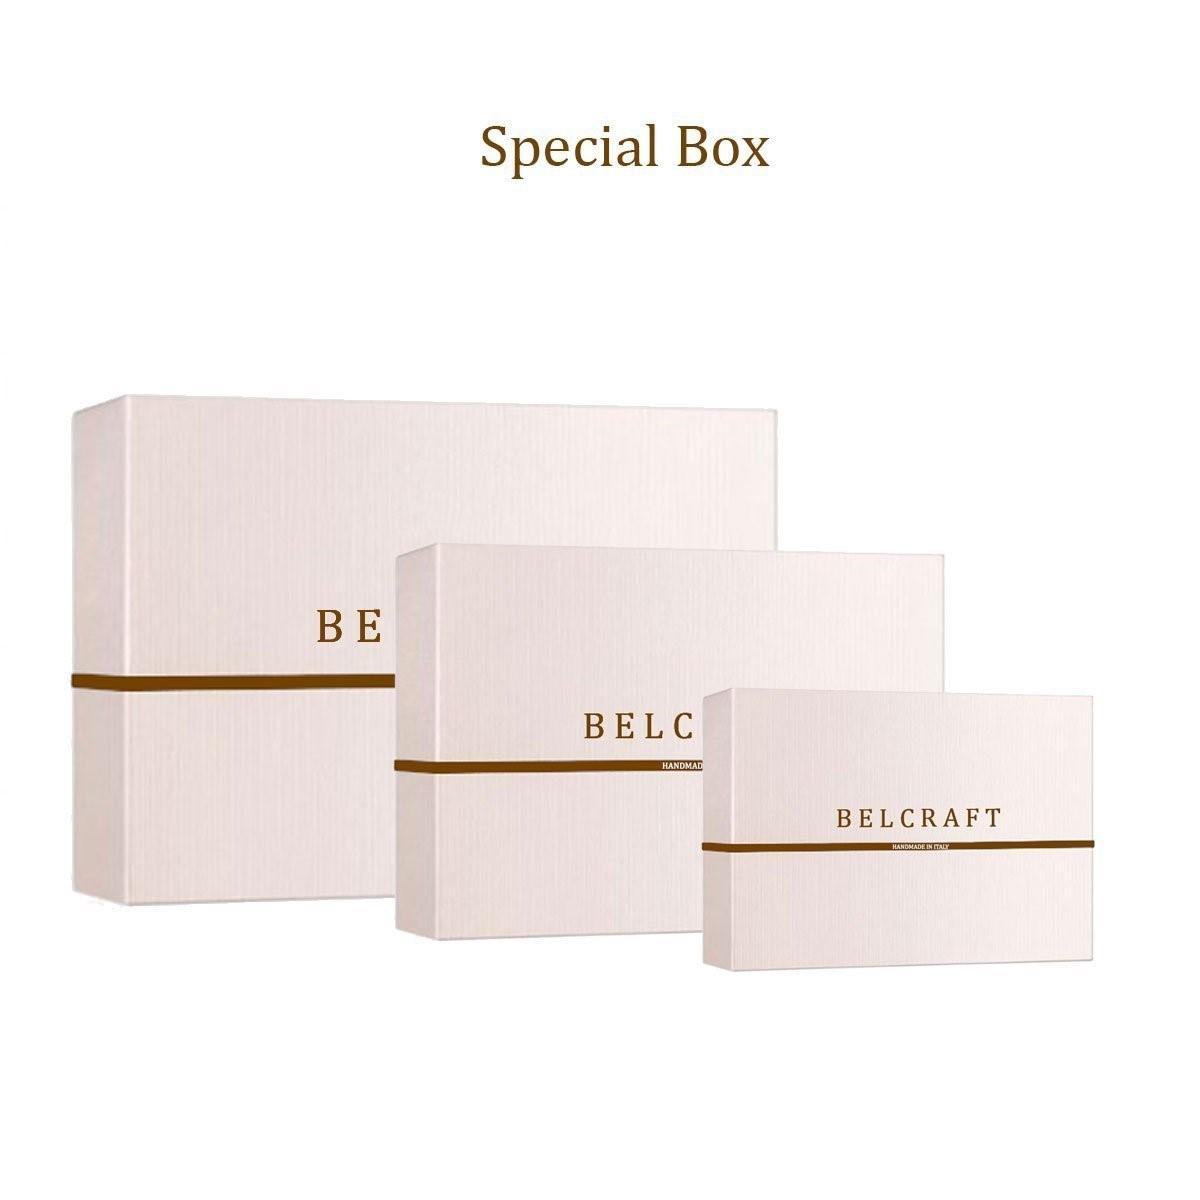 جعبه اختصاصی محصول